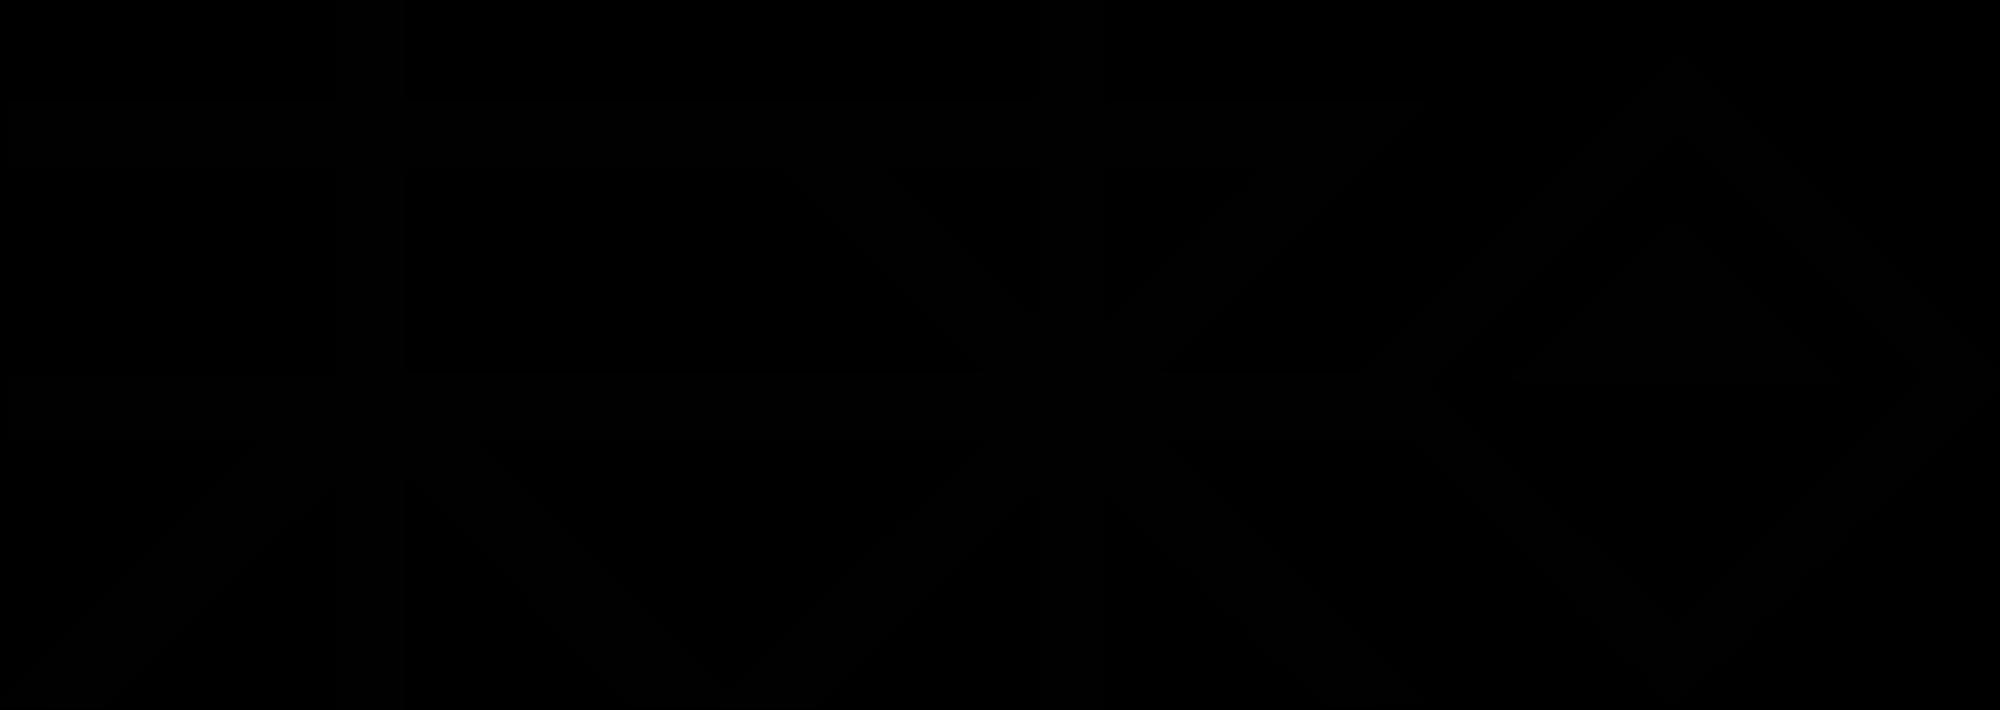 Megaphone clipart forceful. Future foundation danganronpa wiki